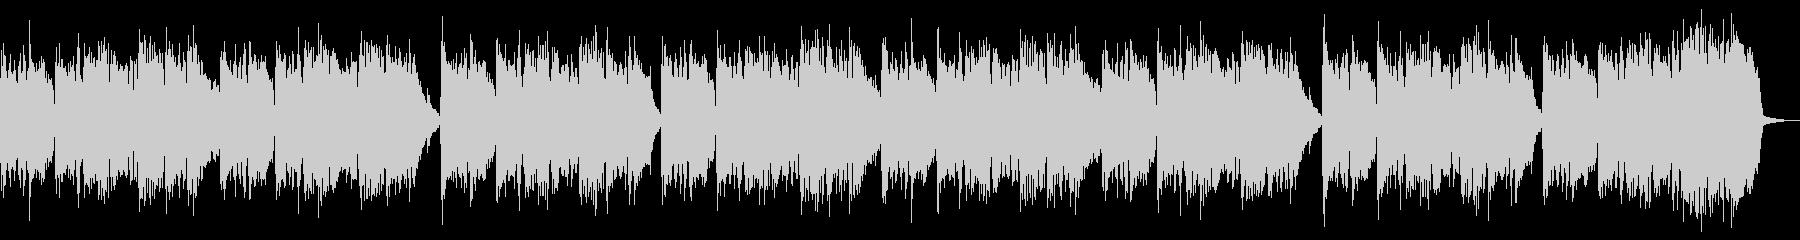 【CM】クールなエレクトロBGM・8の未再生の波形